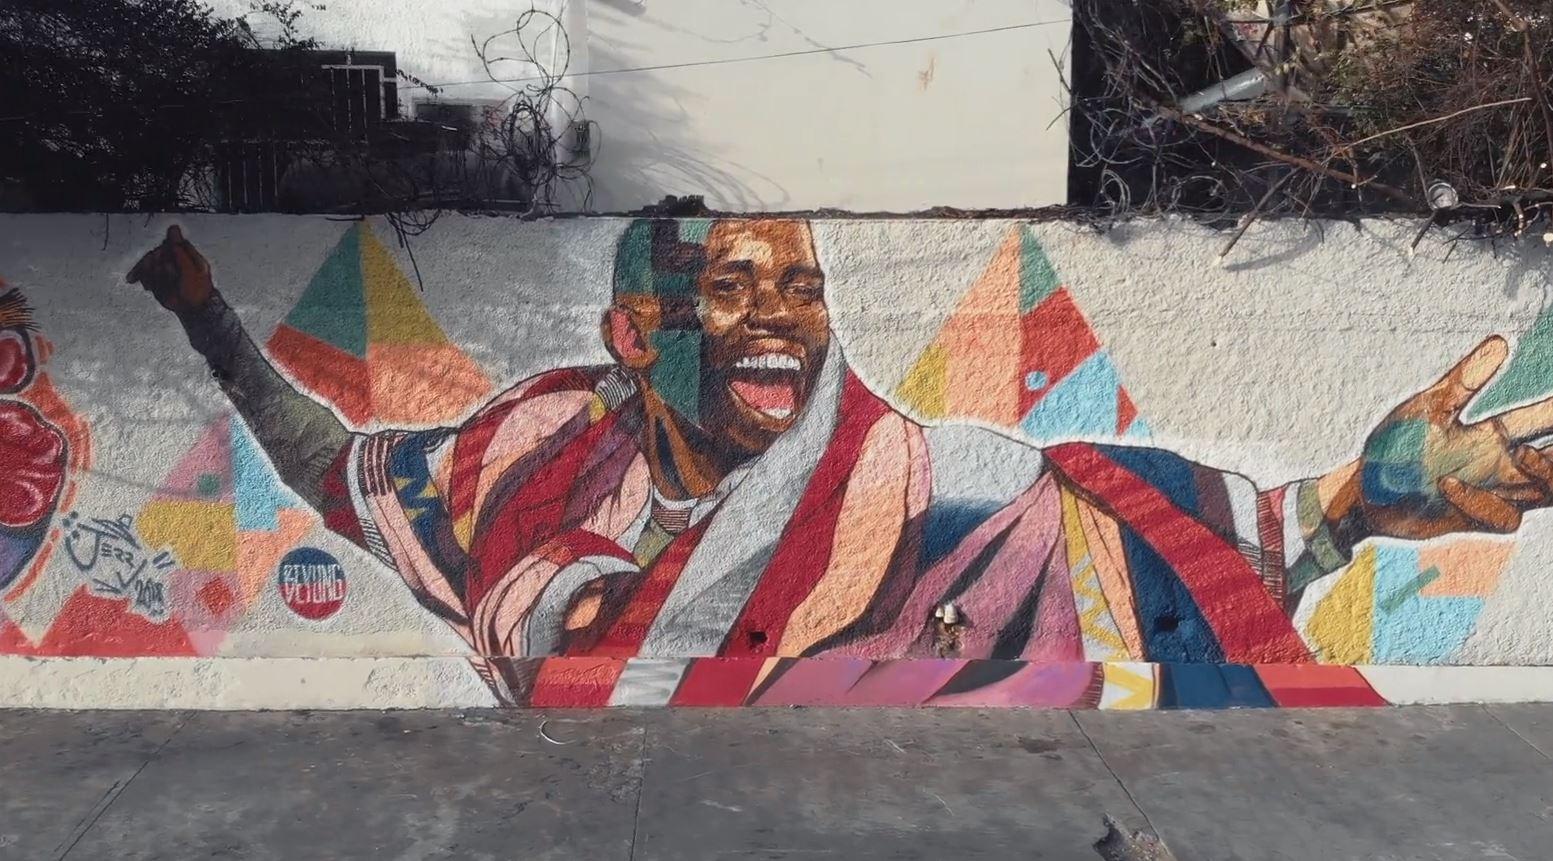 Art Reveals the Heart in Community Amidst Haiti Riots